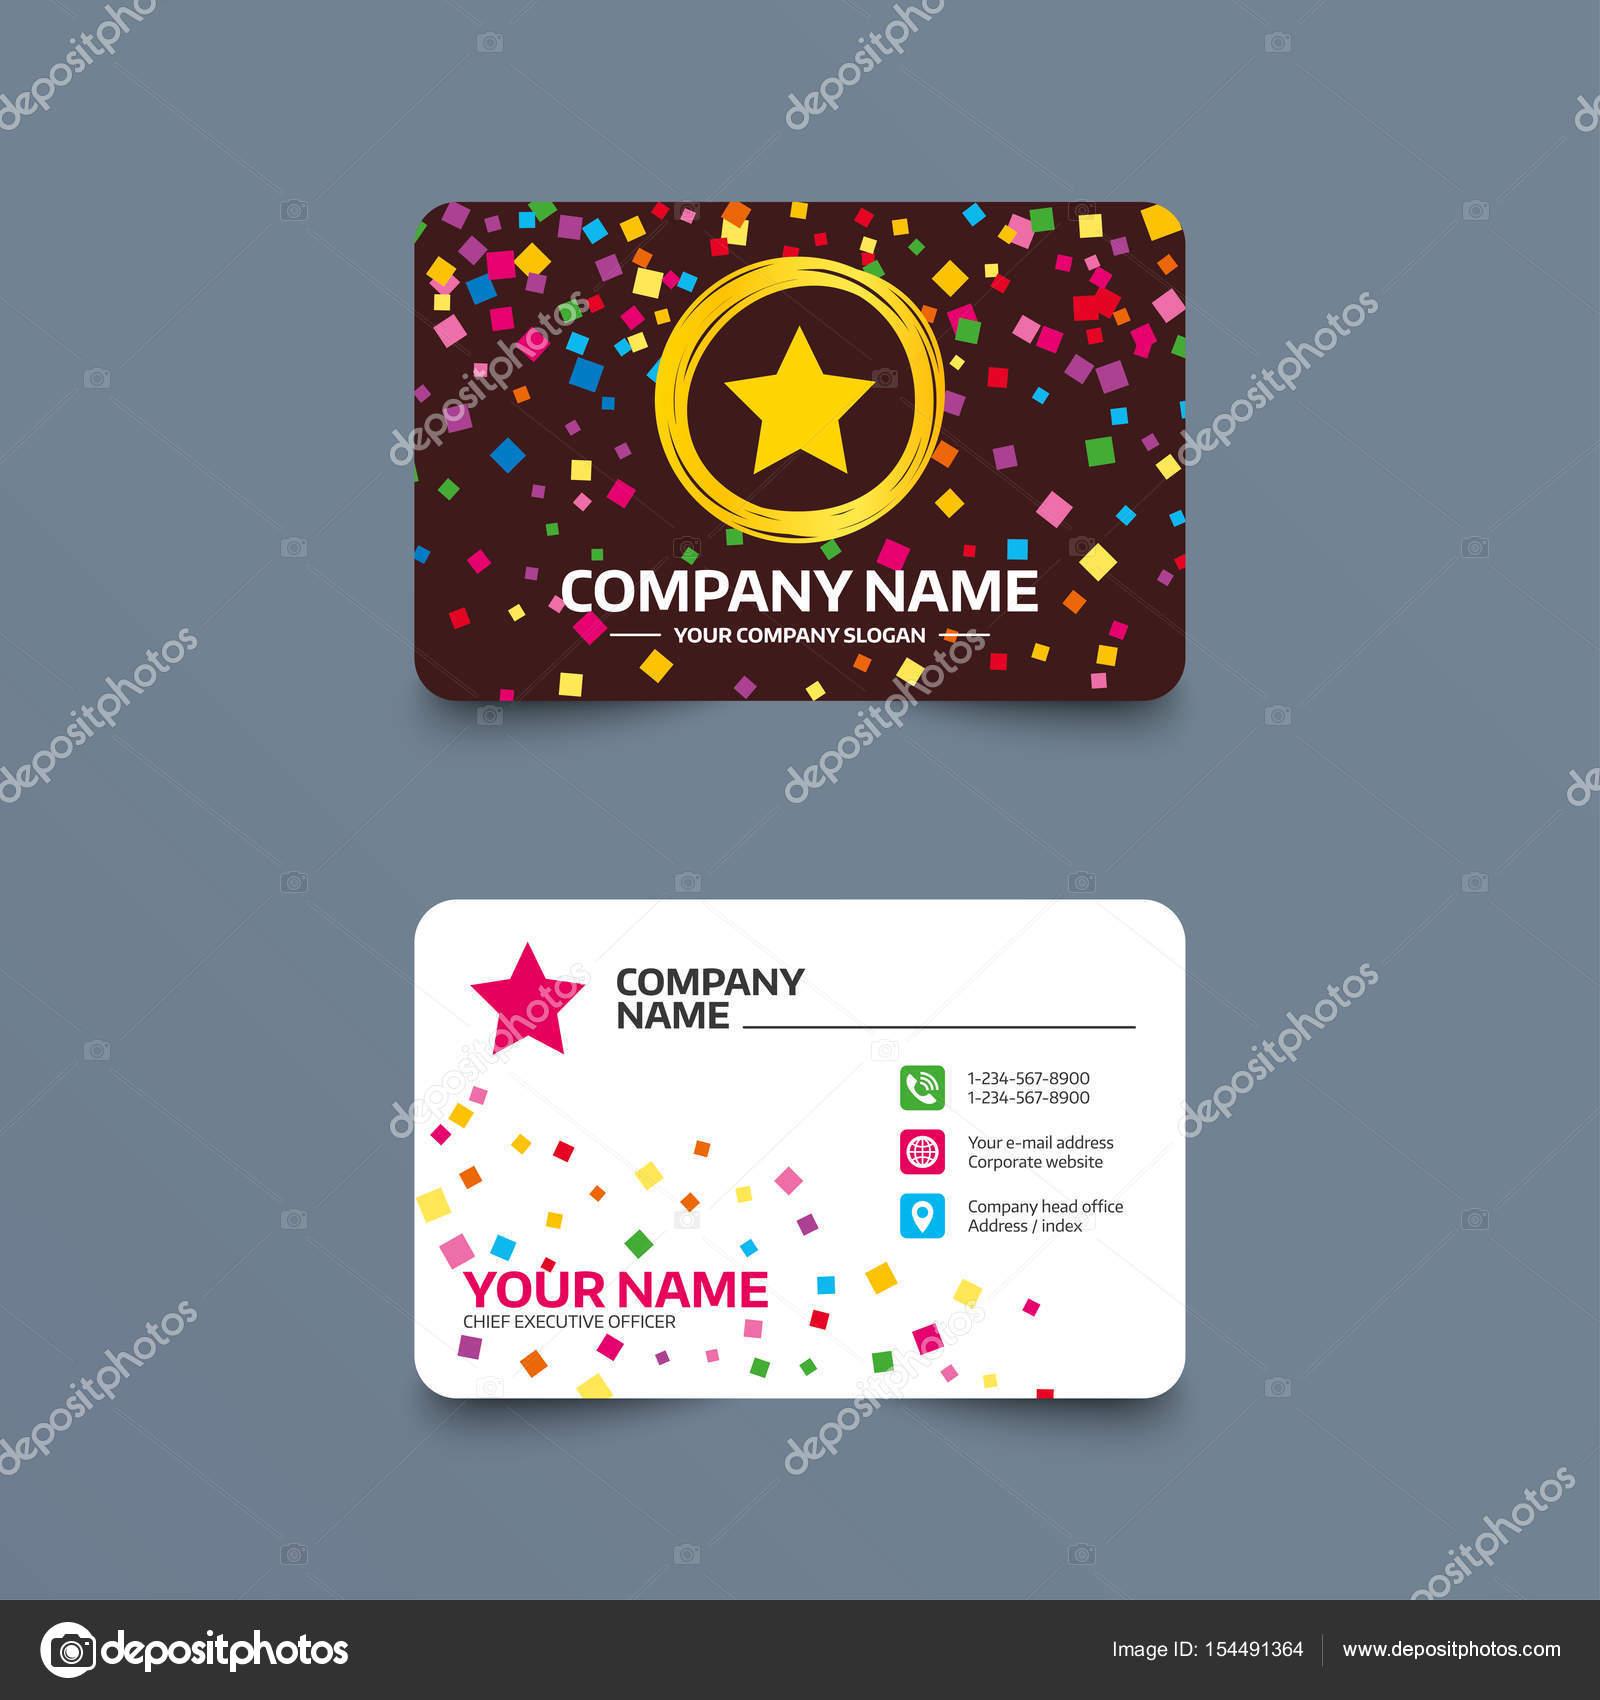 Star business card stock vector blankstock 154491364 star business card stock vector reheart Images